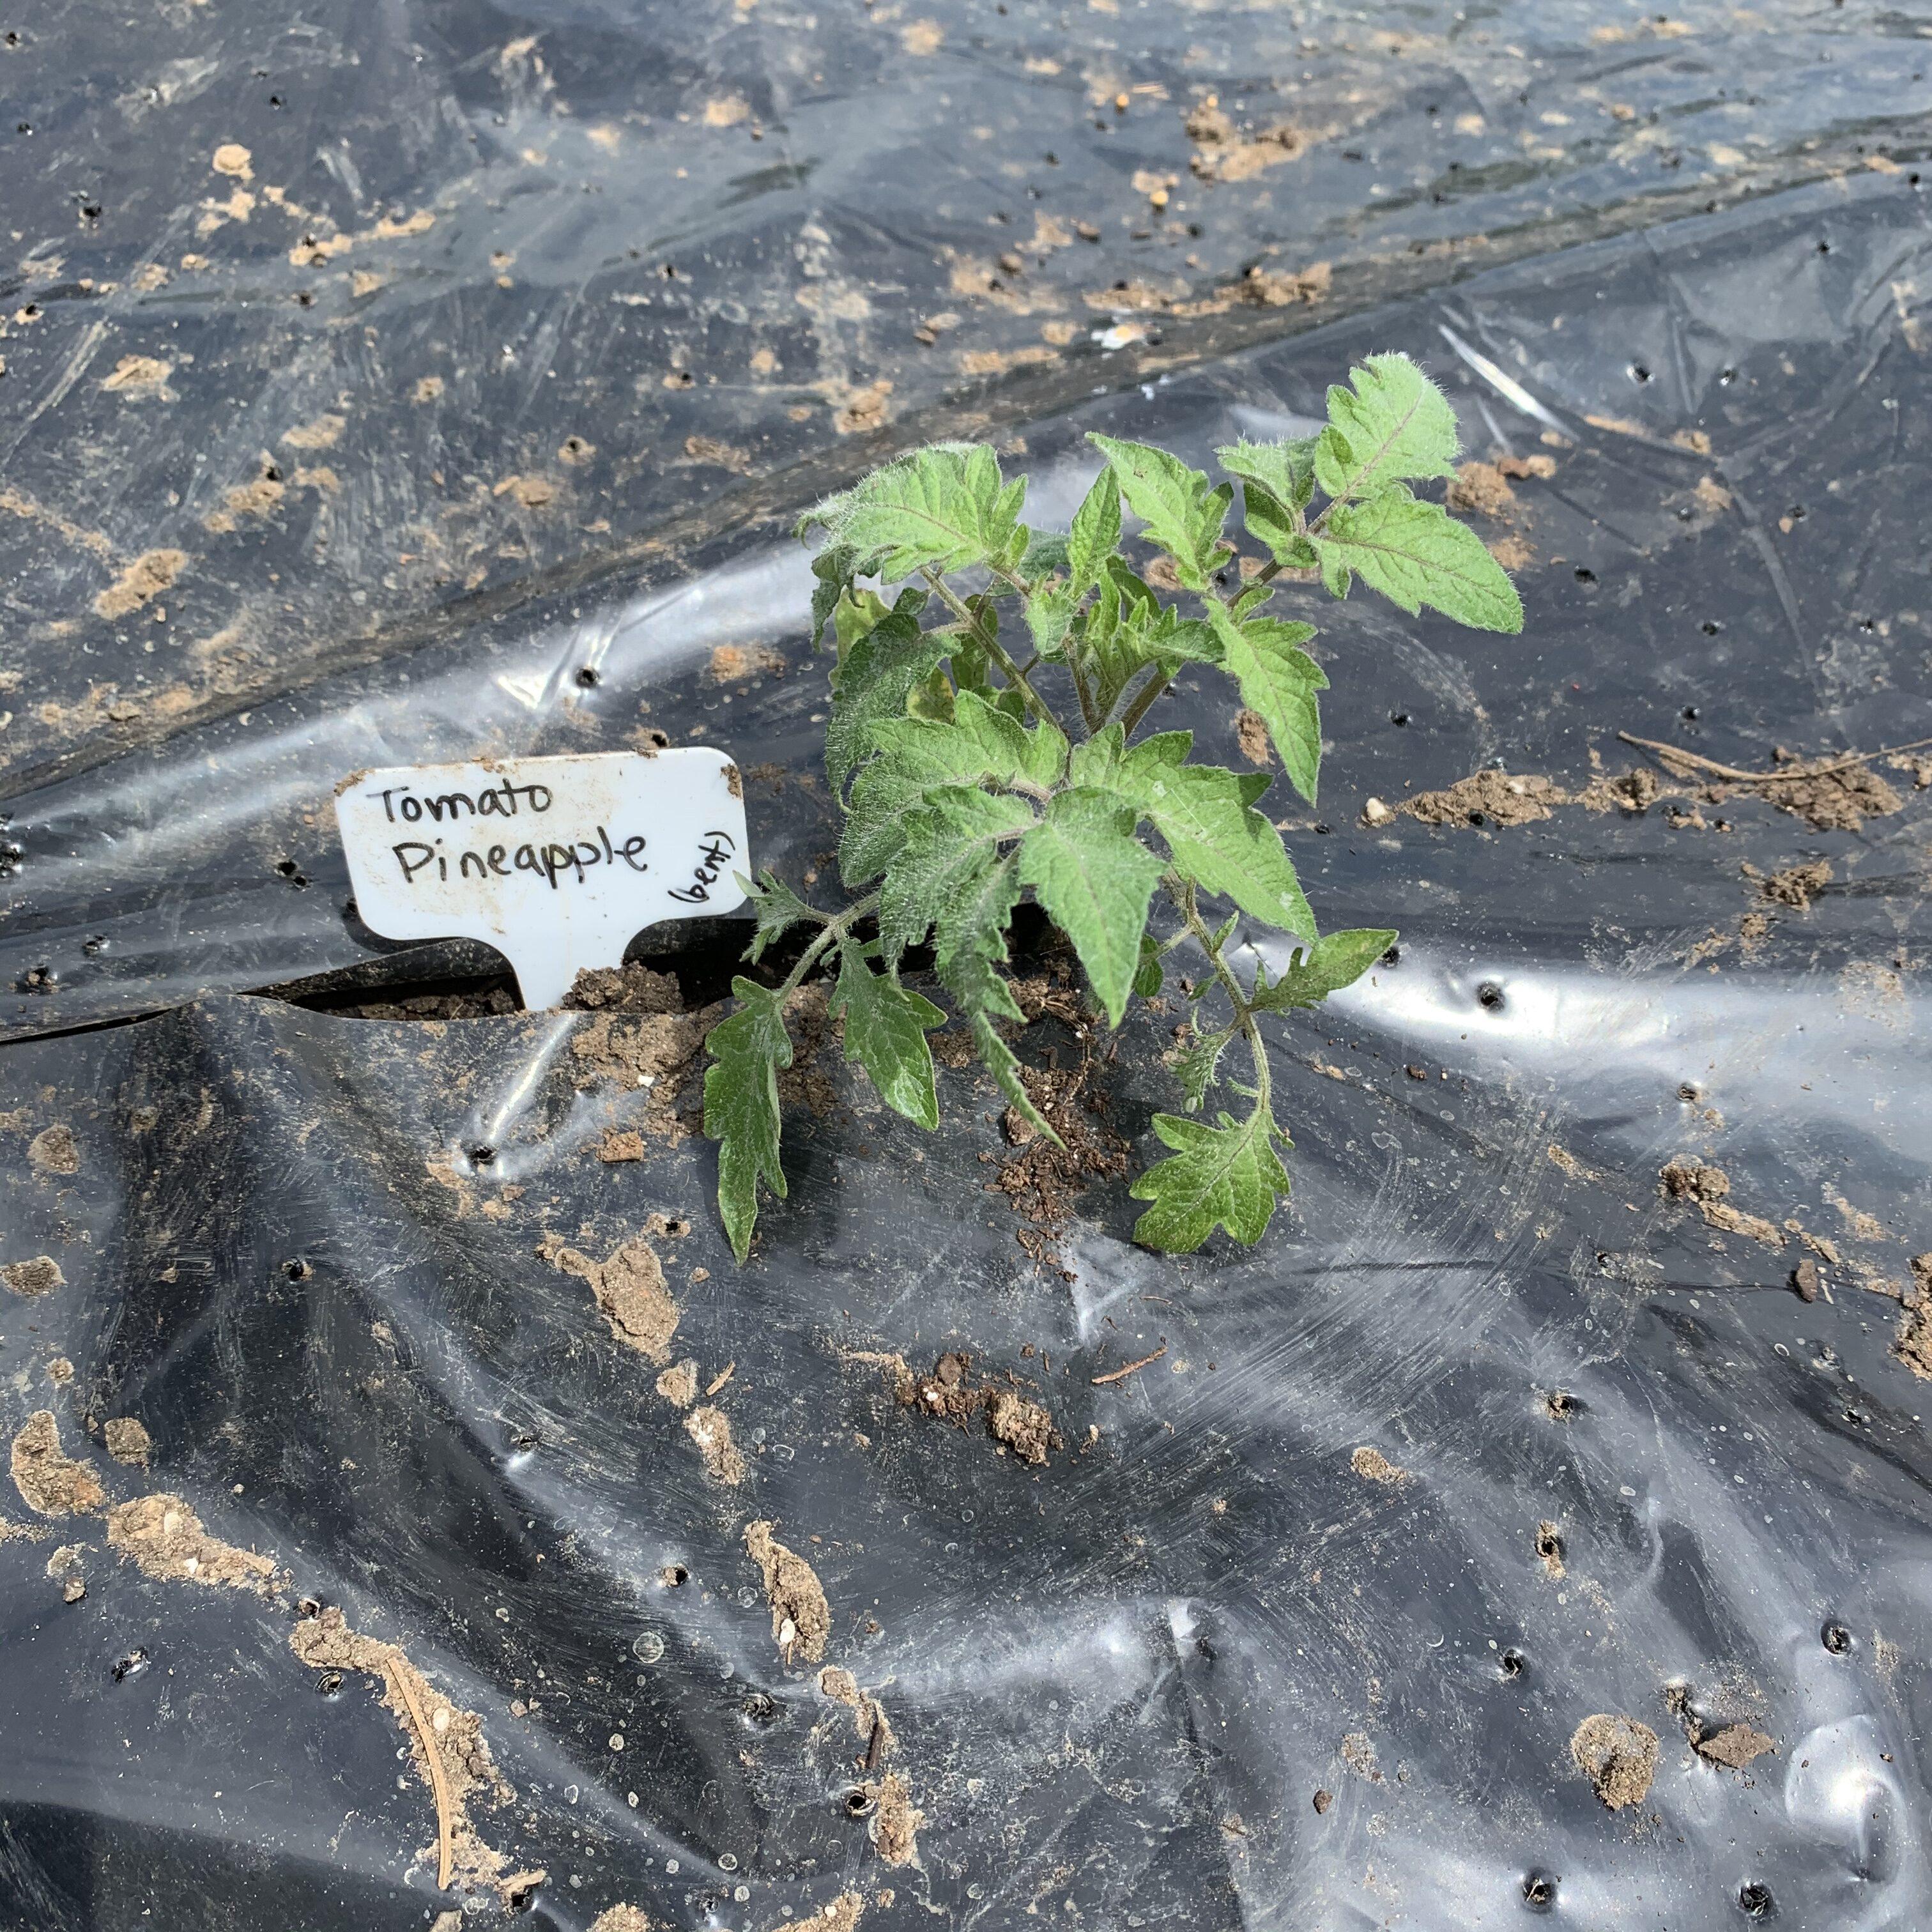 949B9C6F 5637 4BC9 AD6E 3CC4C9B9DE8A Tomato planting day!